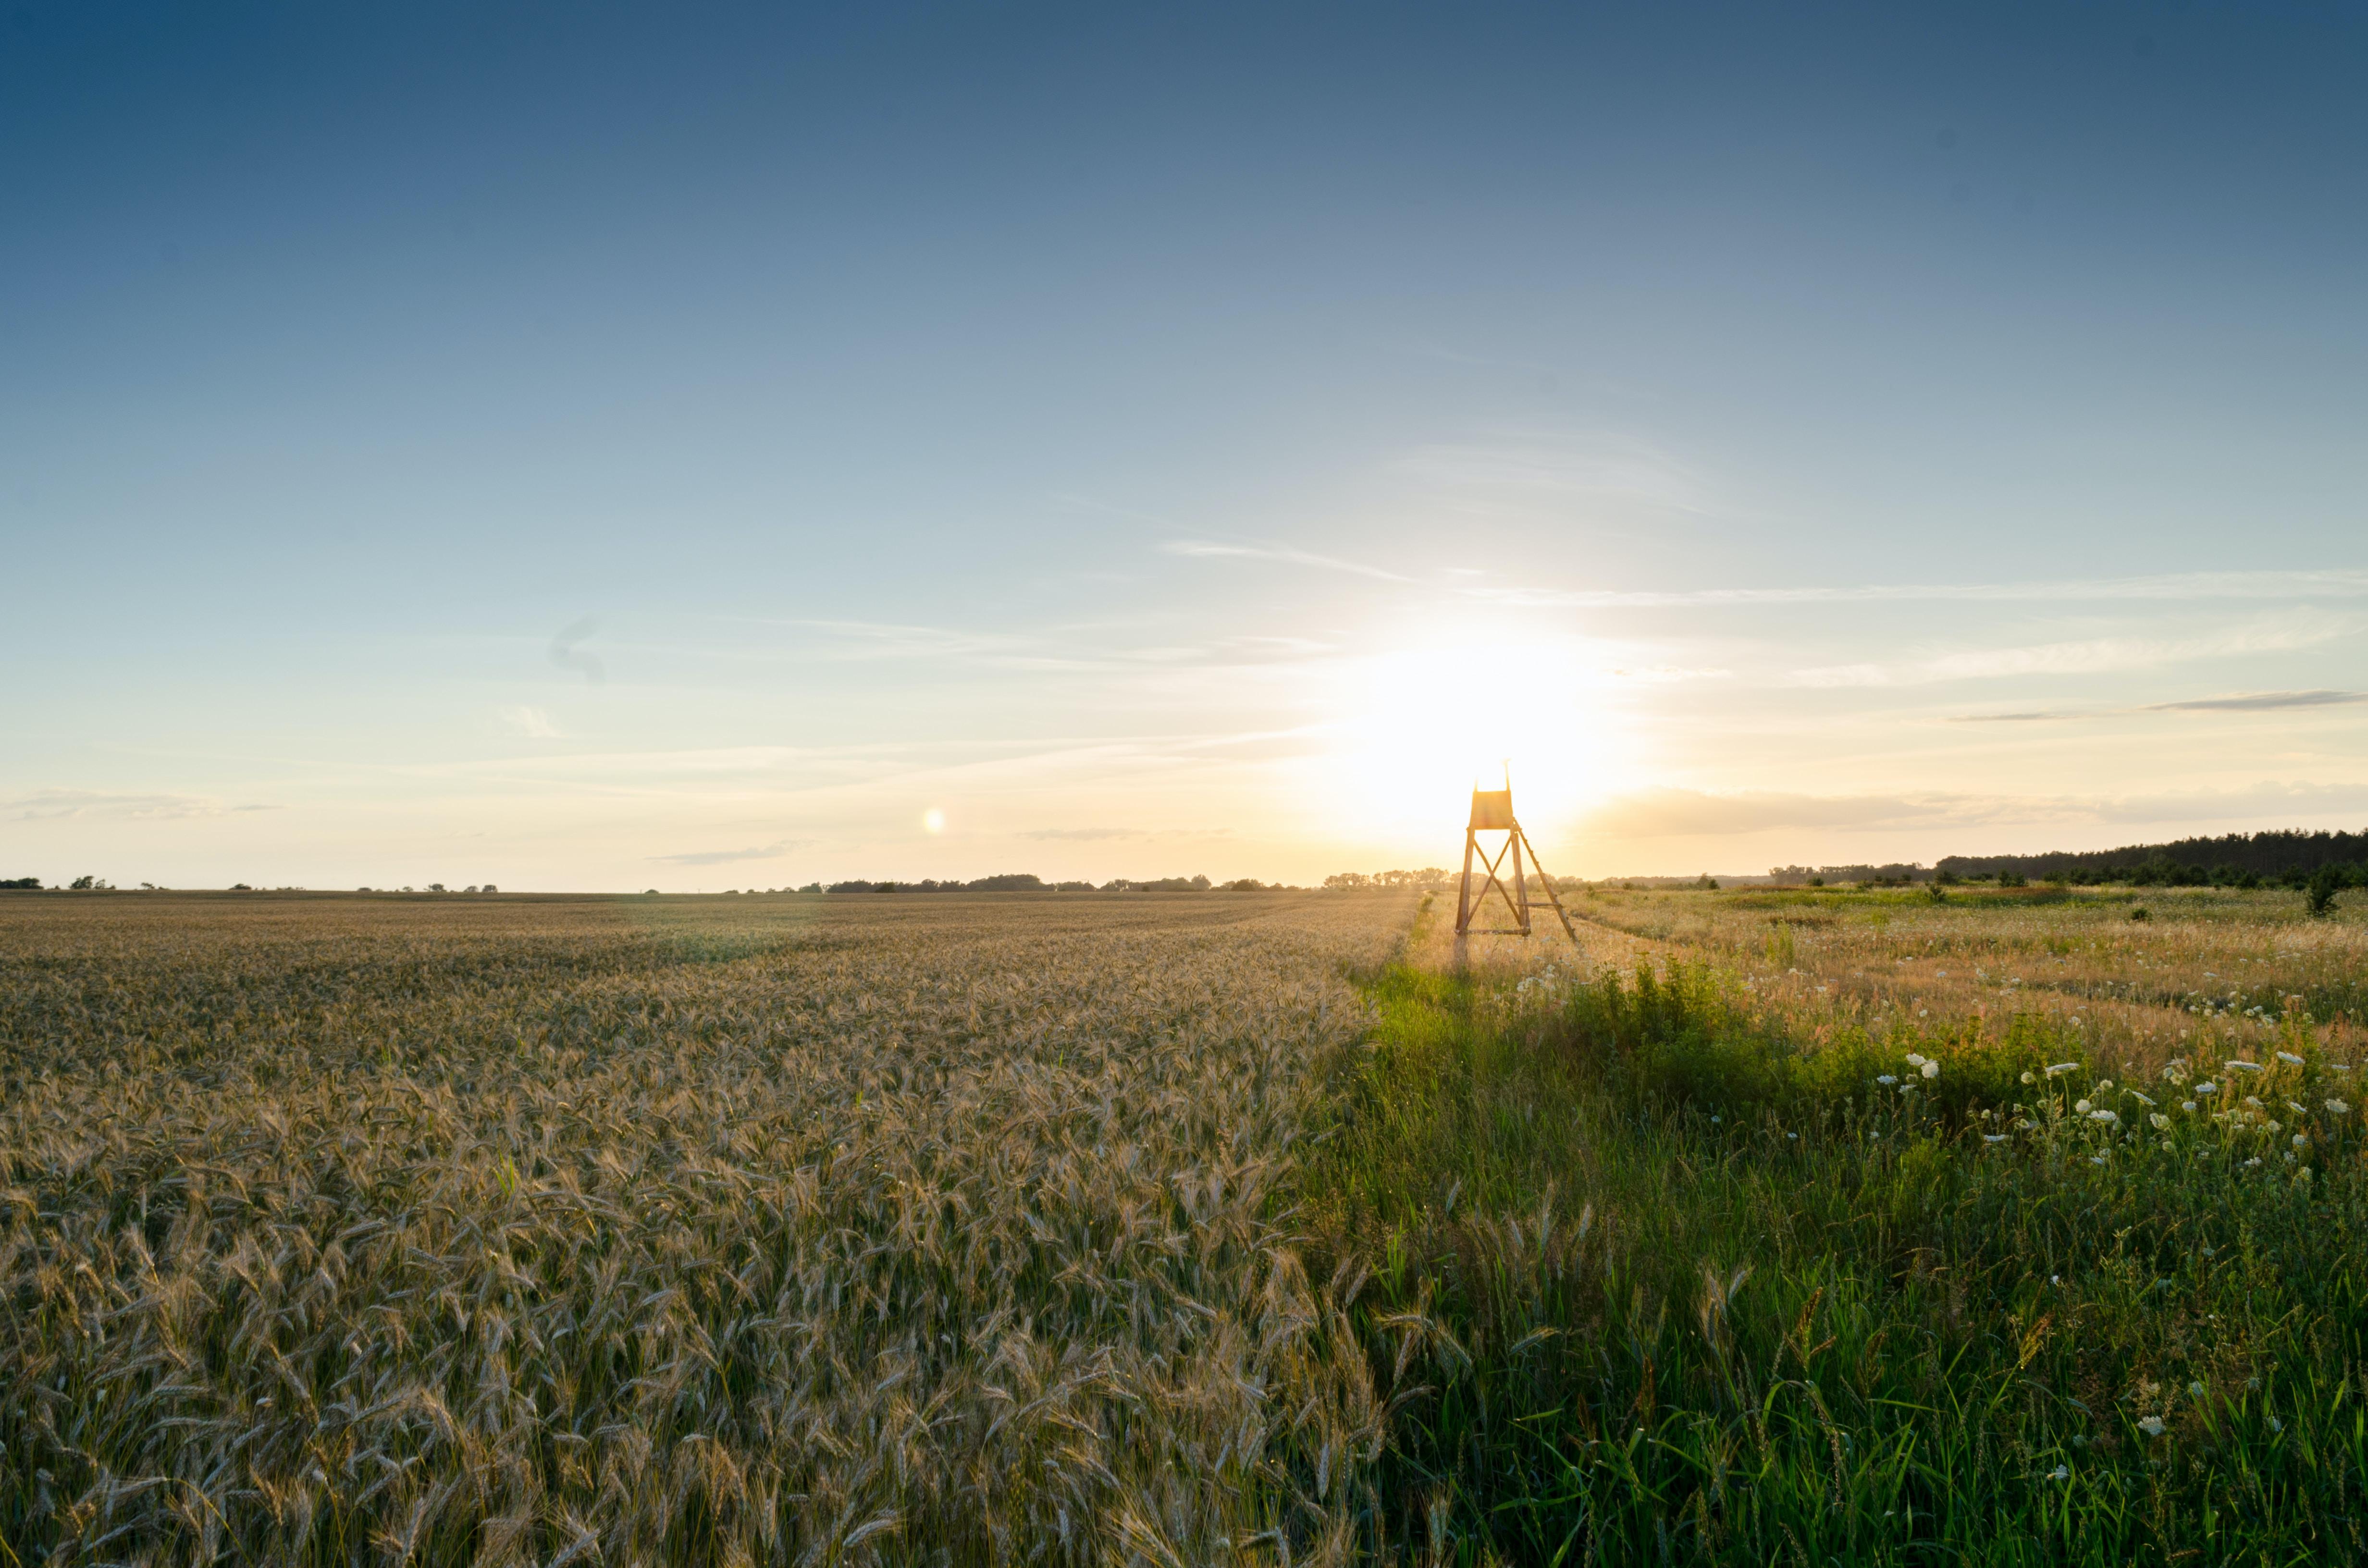 landscape photography of plant field